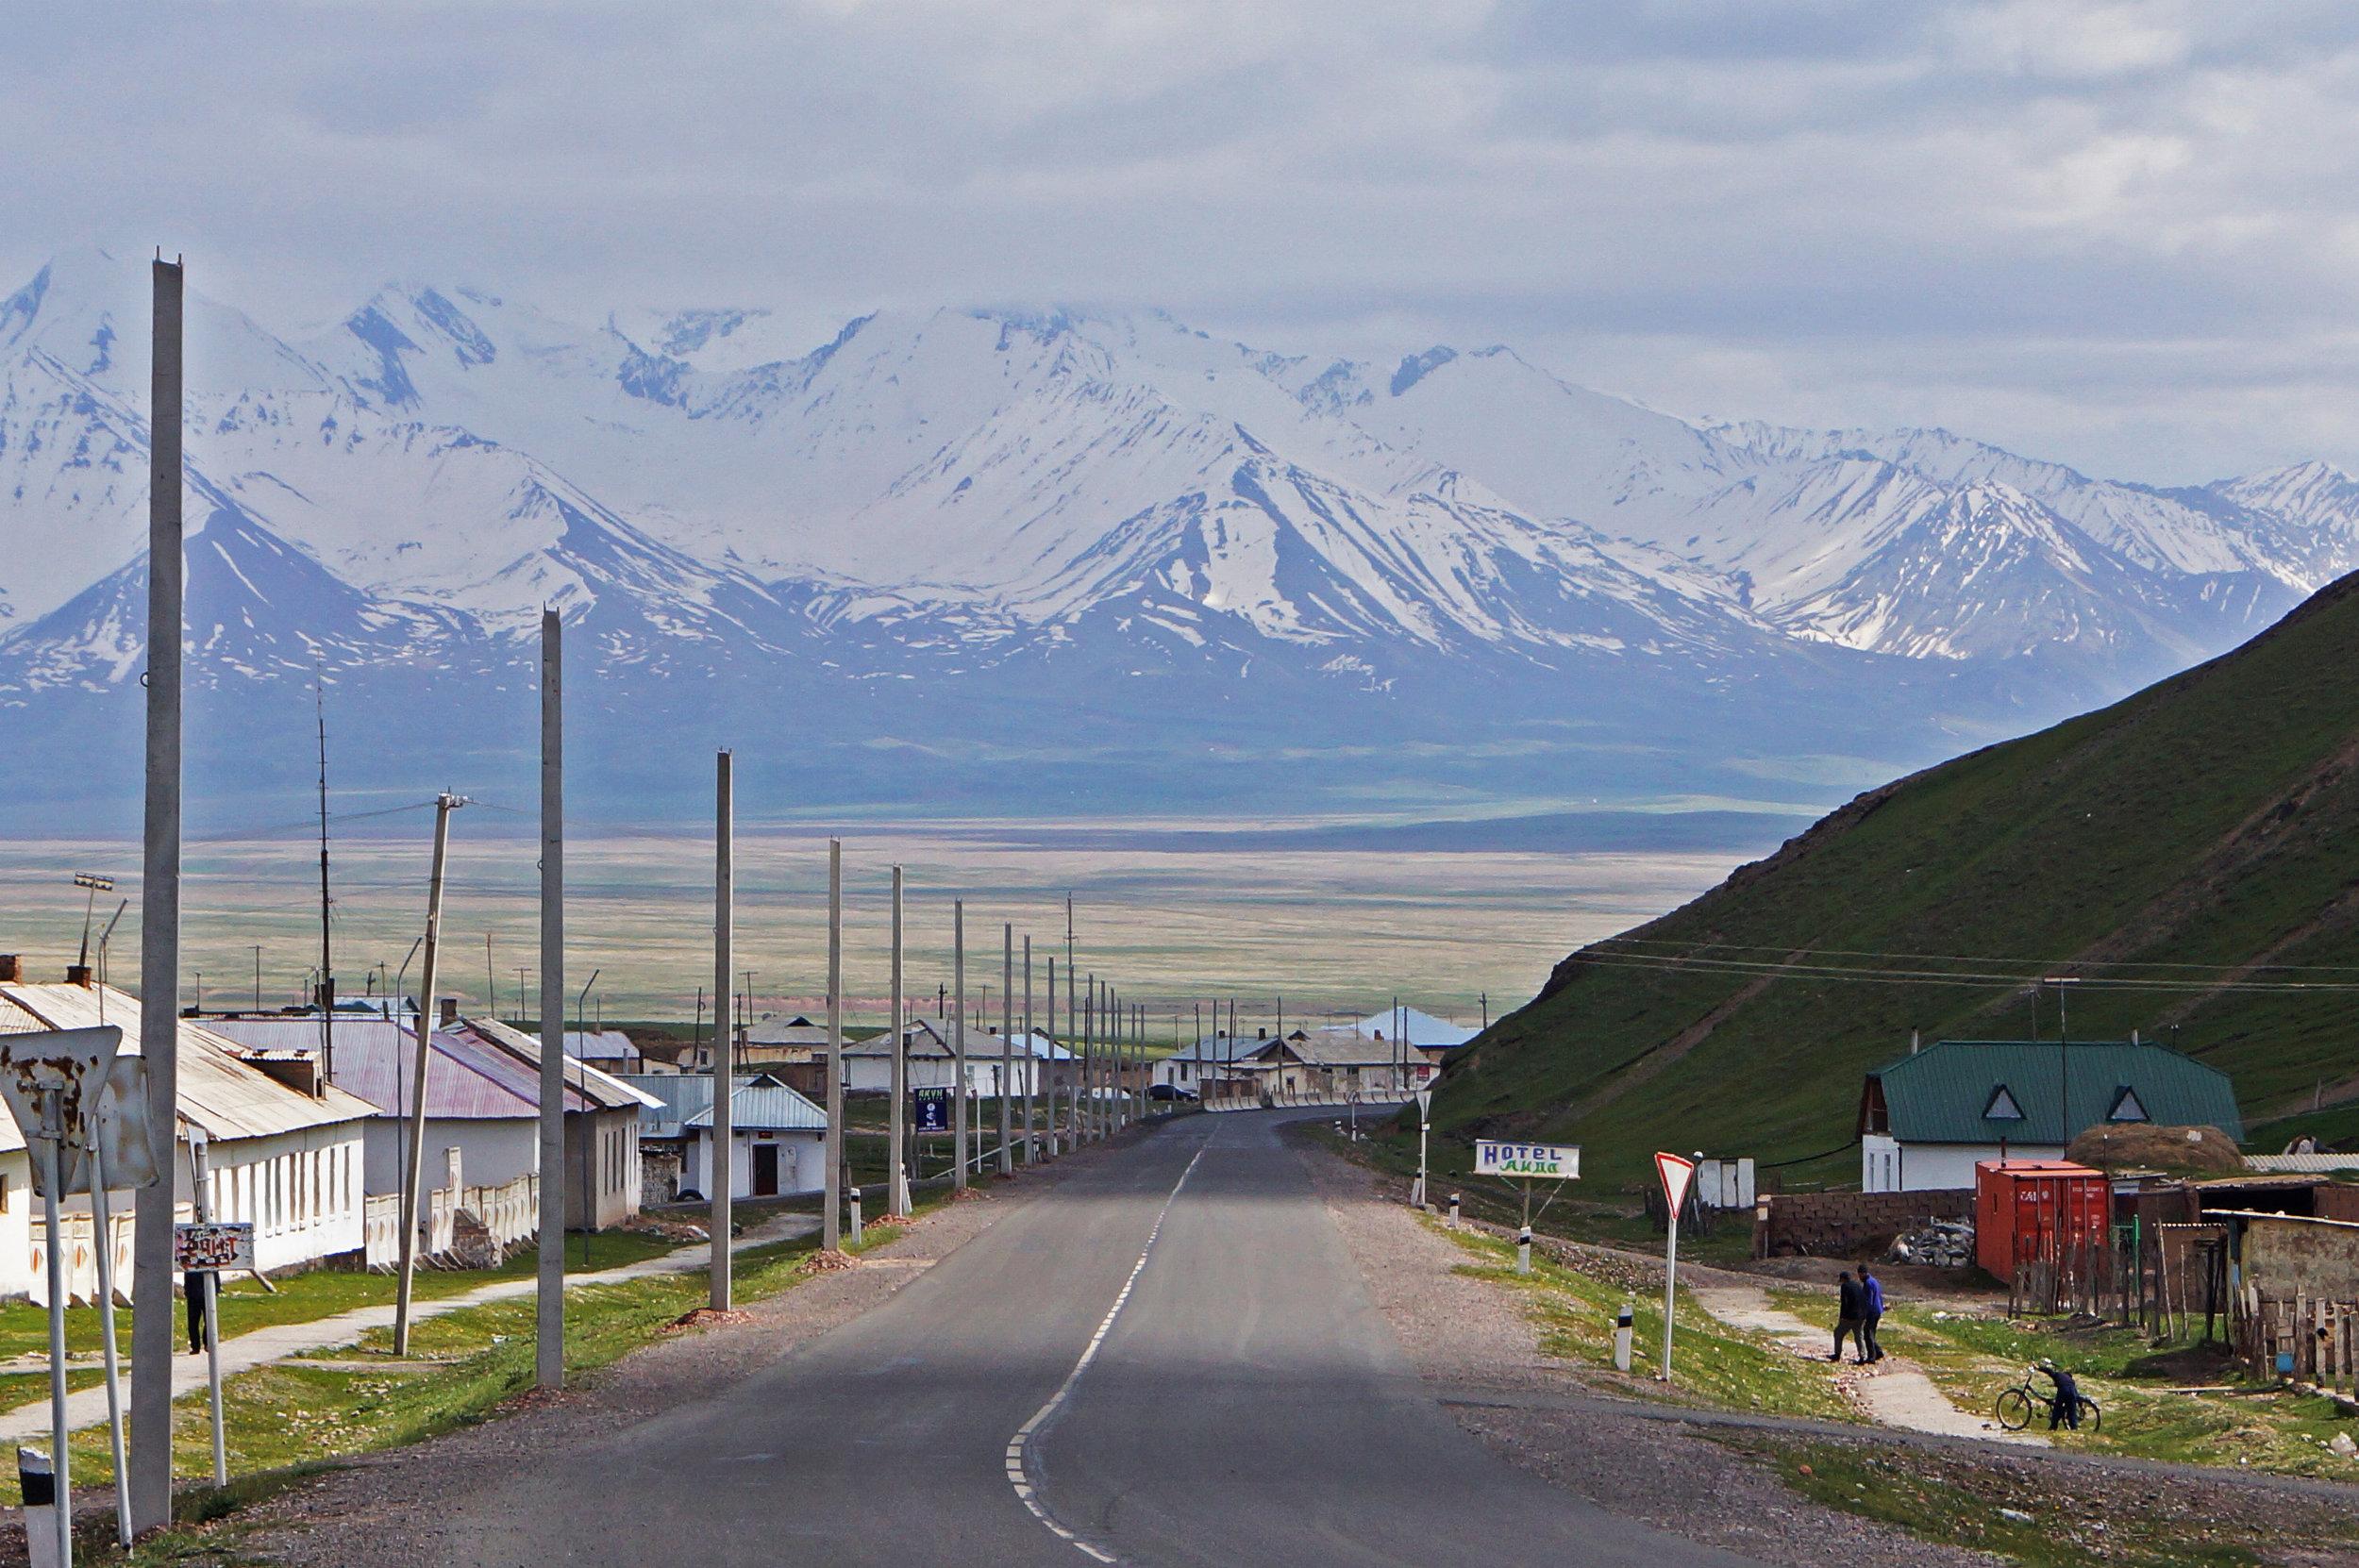 The Wall. Looking towards the Tajik border from Sary Tash, Kyrgyzstan.